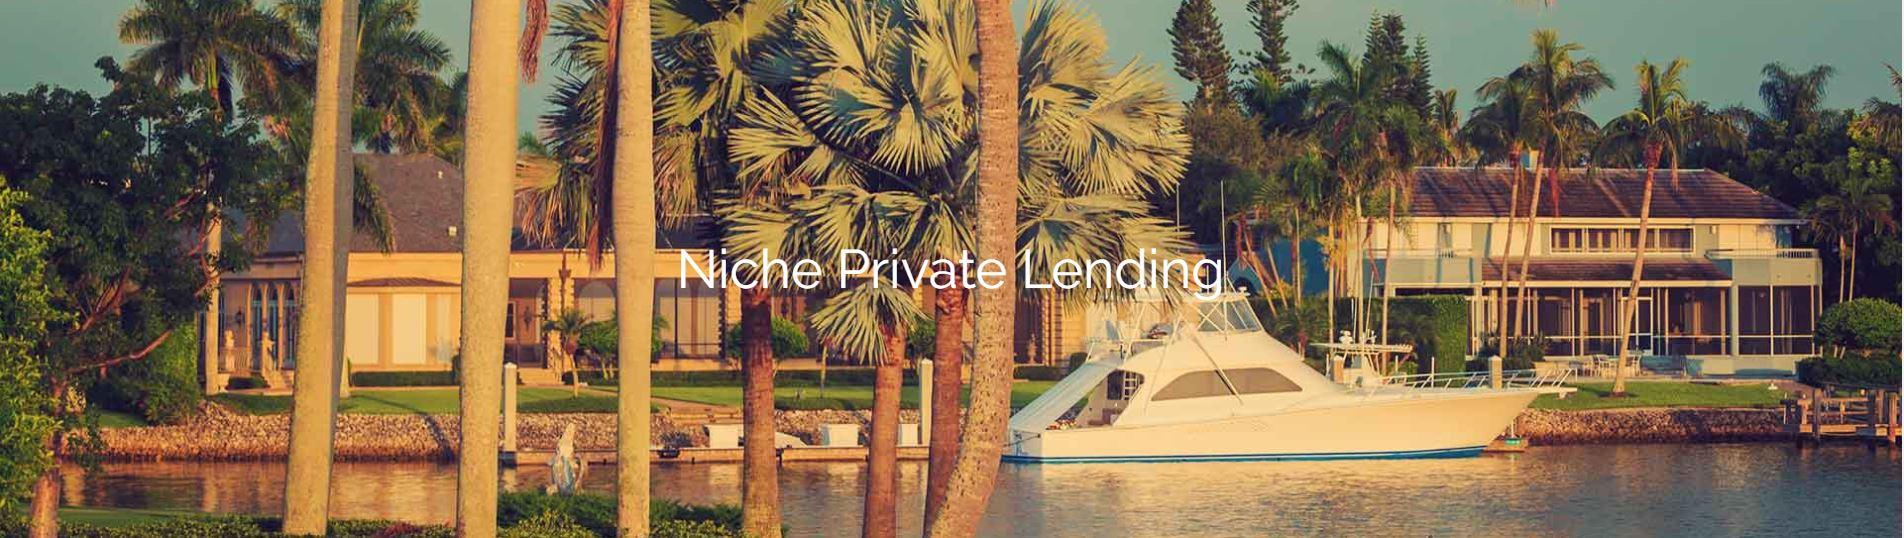 Bonita Springs Real Estate broker, Naples Real Estate Broker, Bonita Real Estate Marketing, Private Lenders, Naples Private Lending